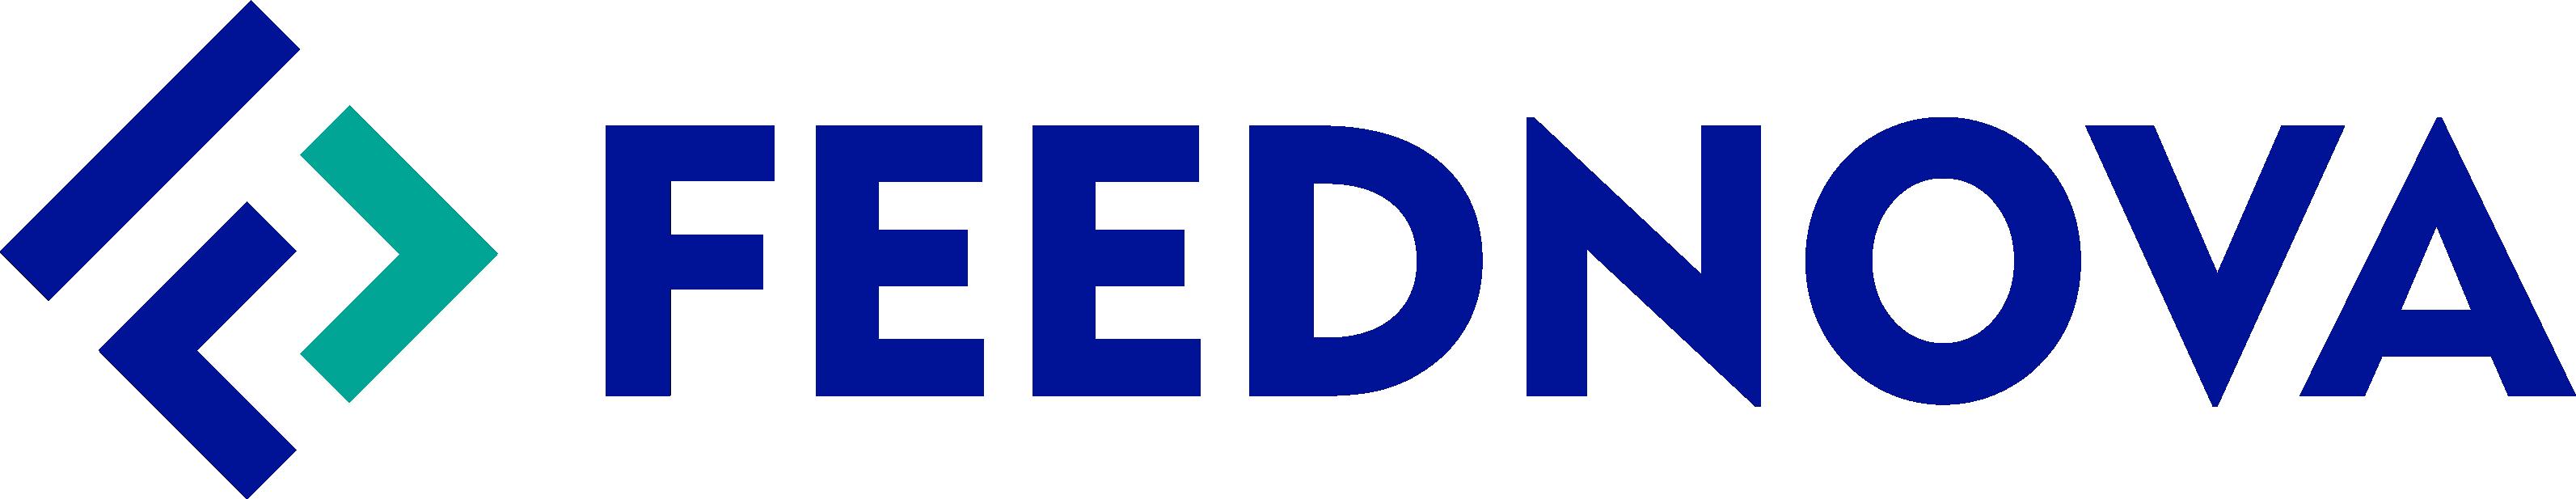 Feednova